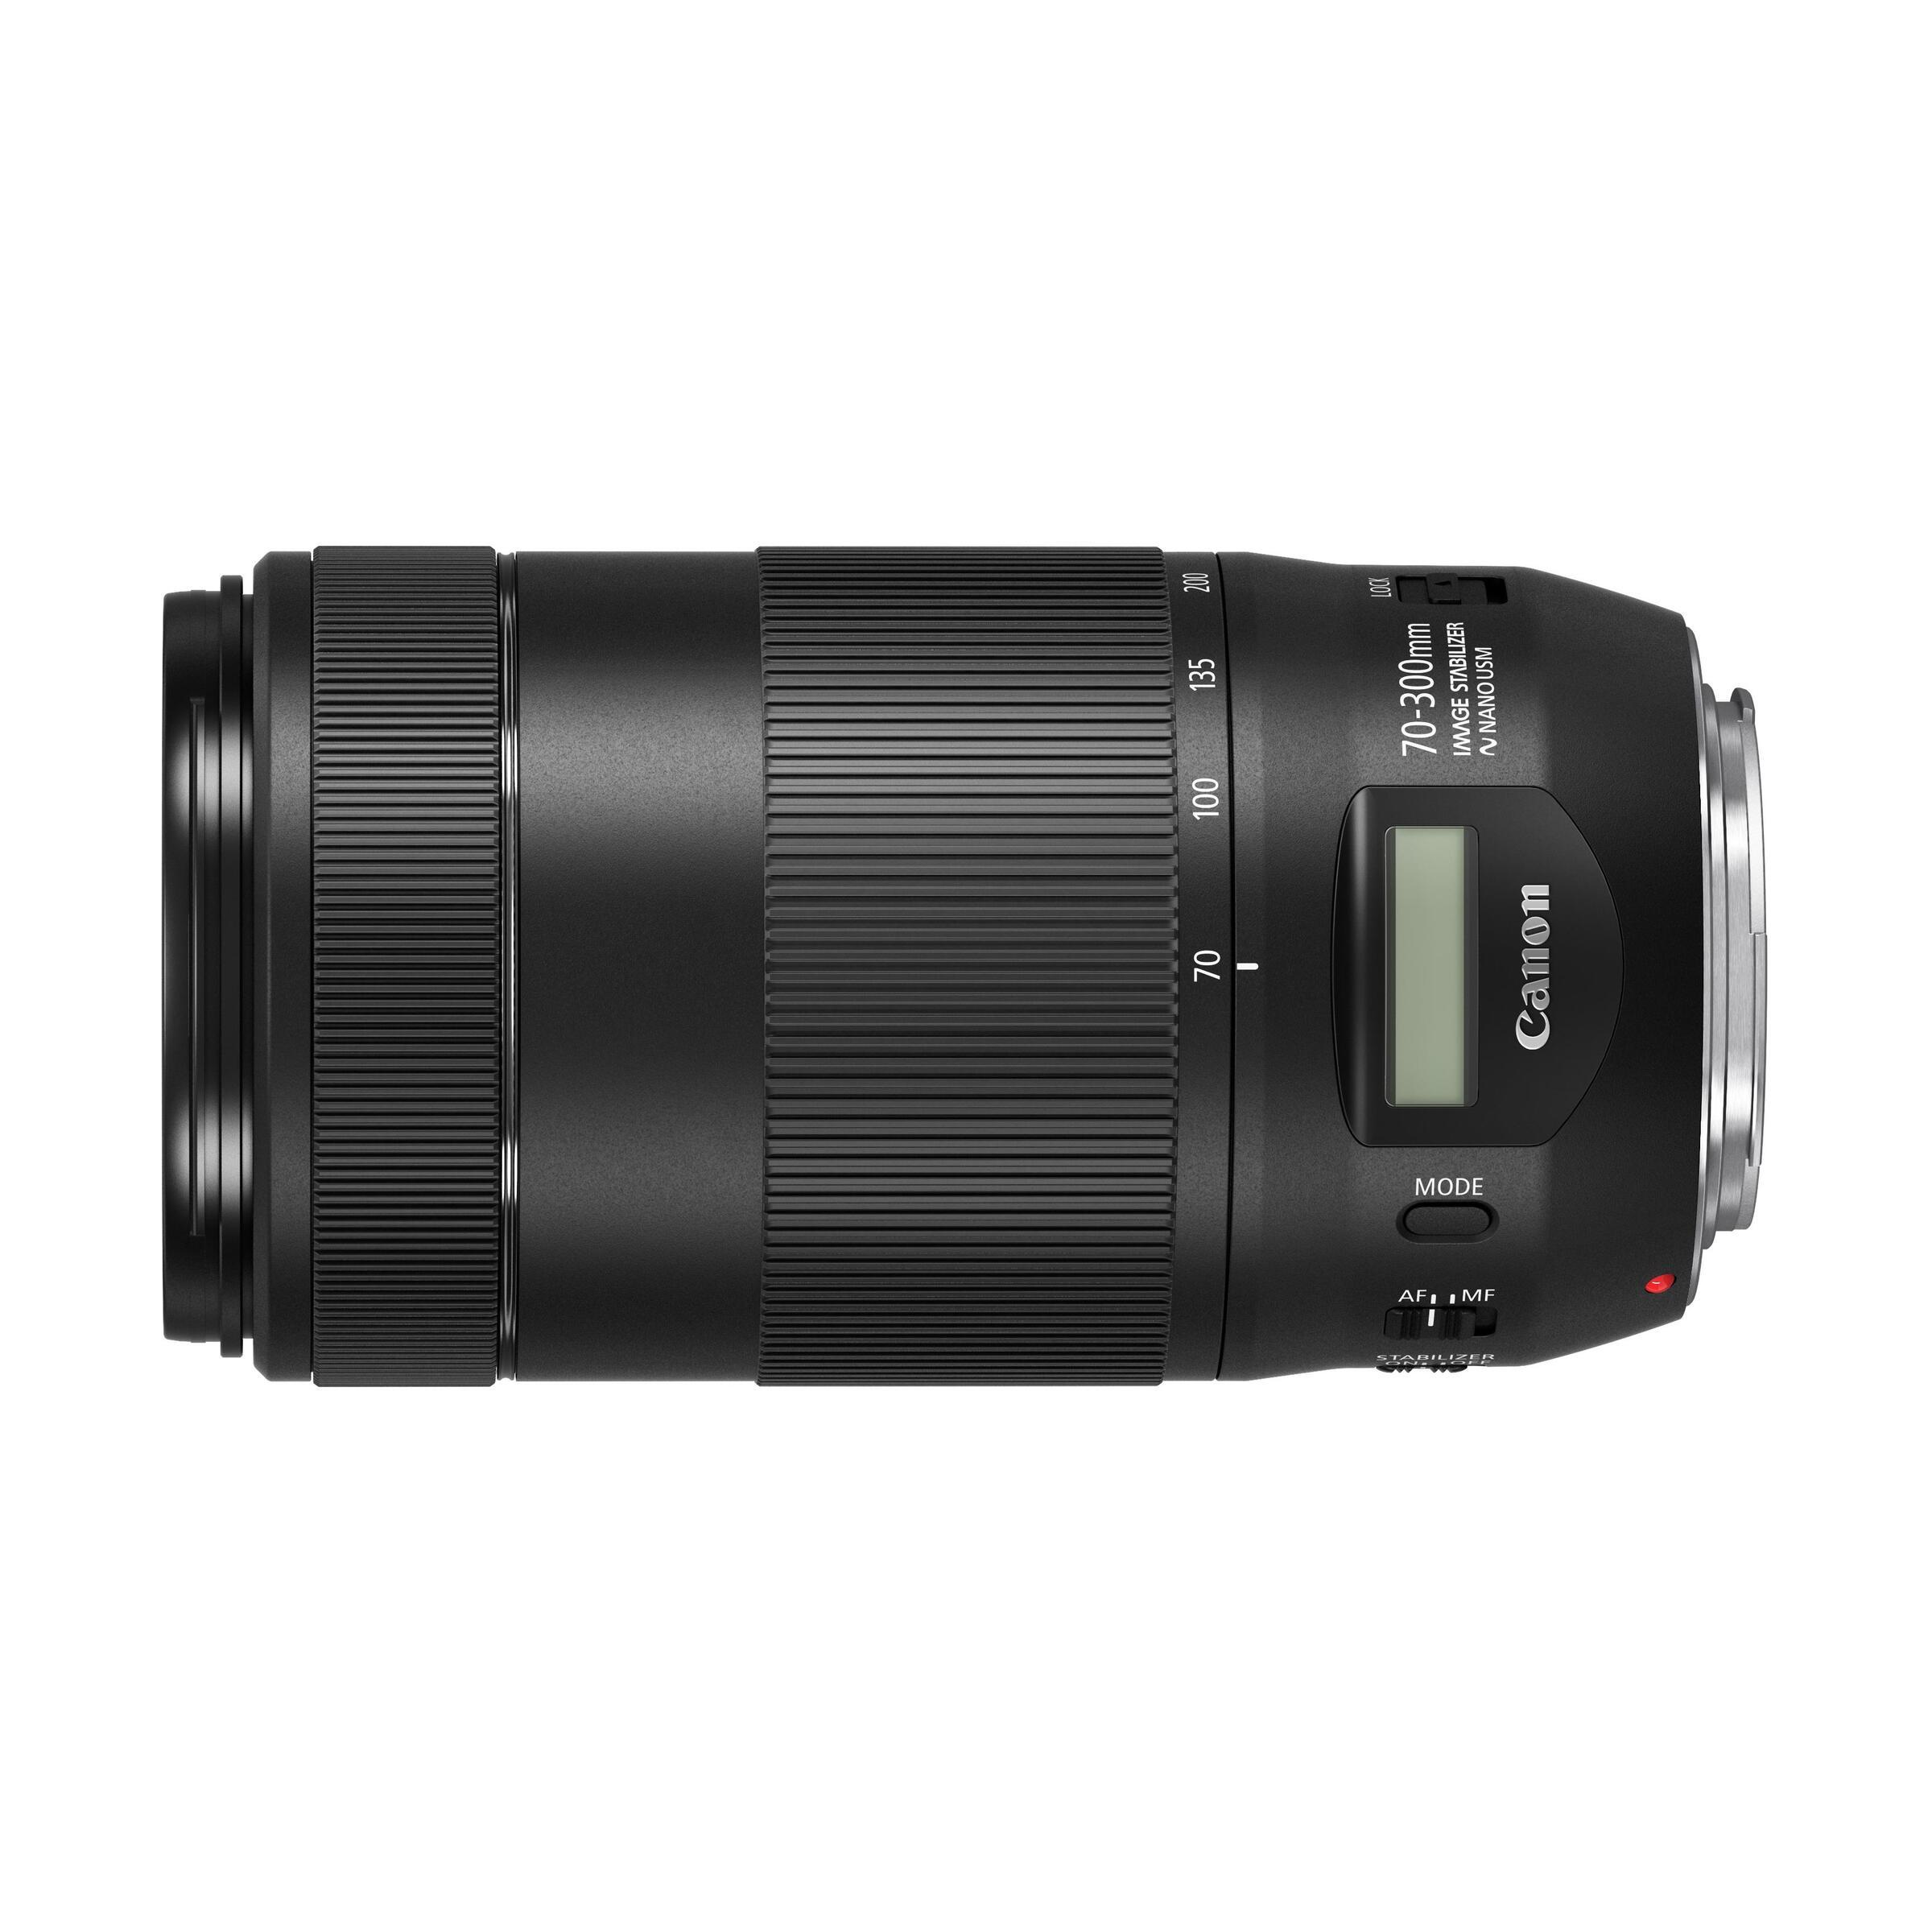 Canon EF 70-300mm f/4,0-5,6 IS II USM